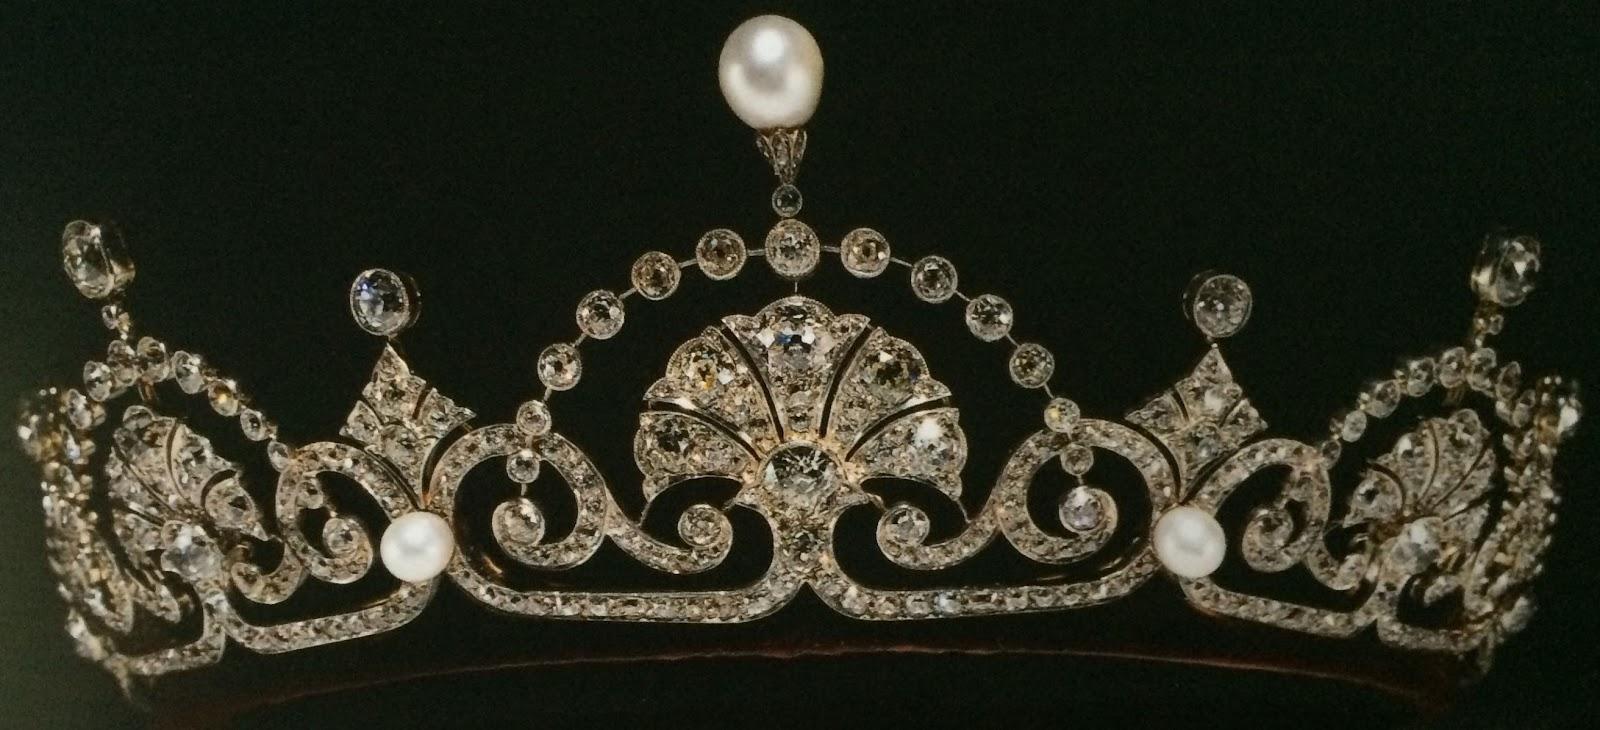 Tiara Mania Queen Elizabeth Of The United Kingdoms Lotus Flower Tiara